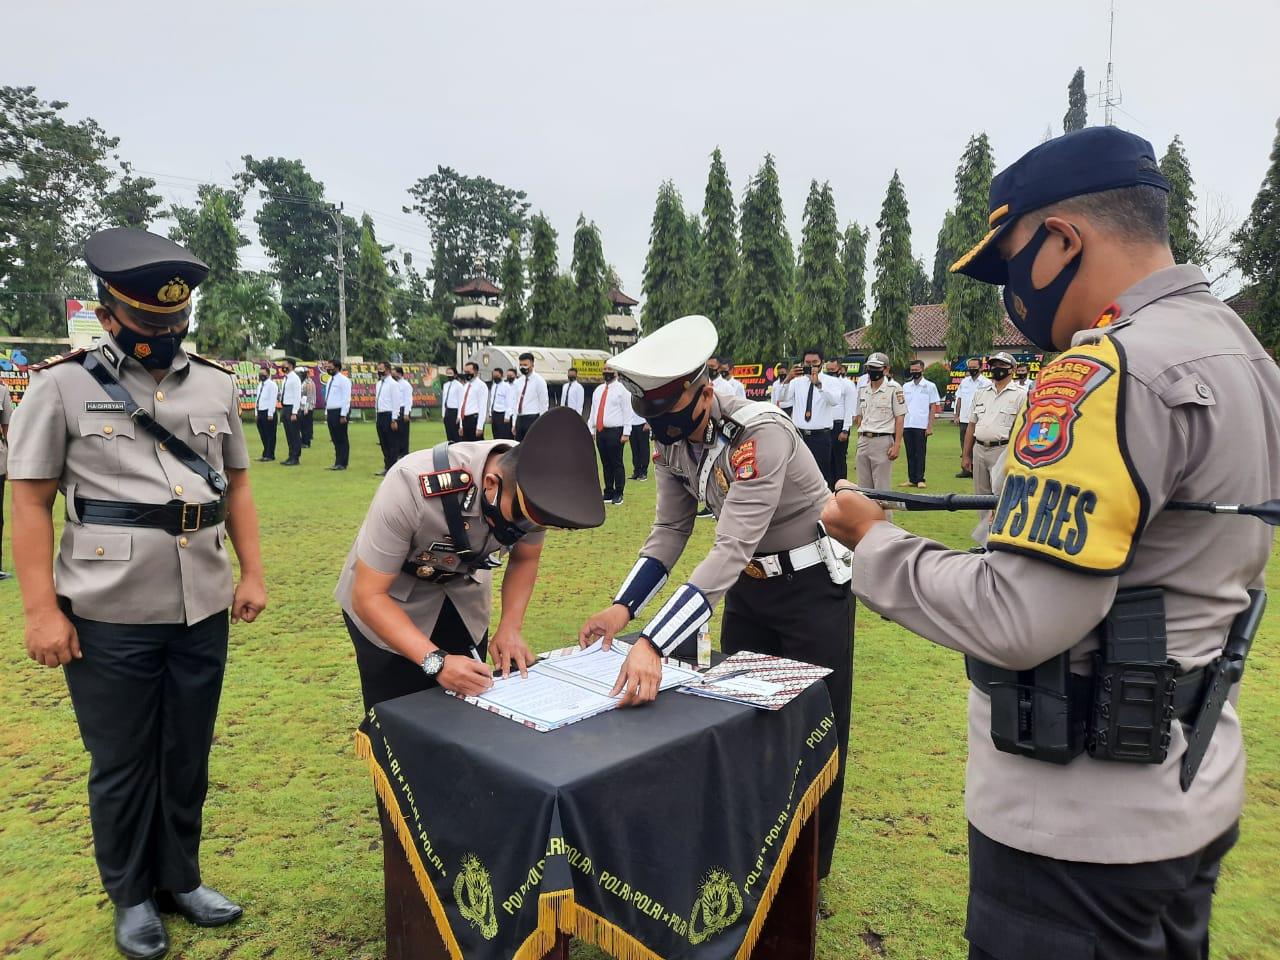 Kapolres Lampung Utara Pimpin Sertijab Kasat Intelkam dan Kasat Binmas